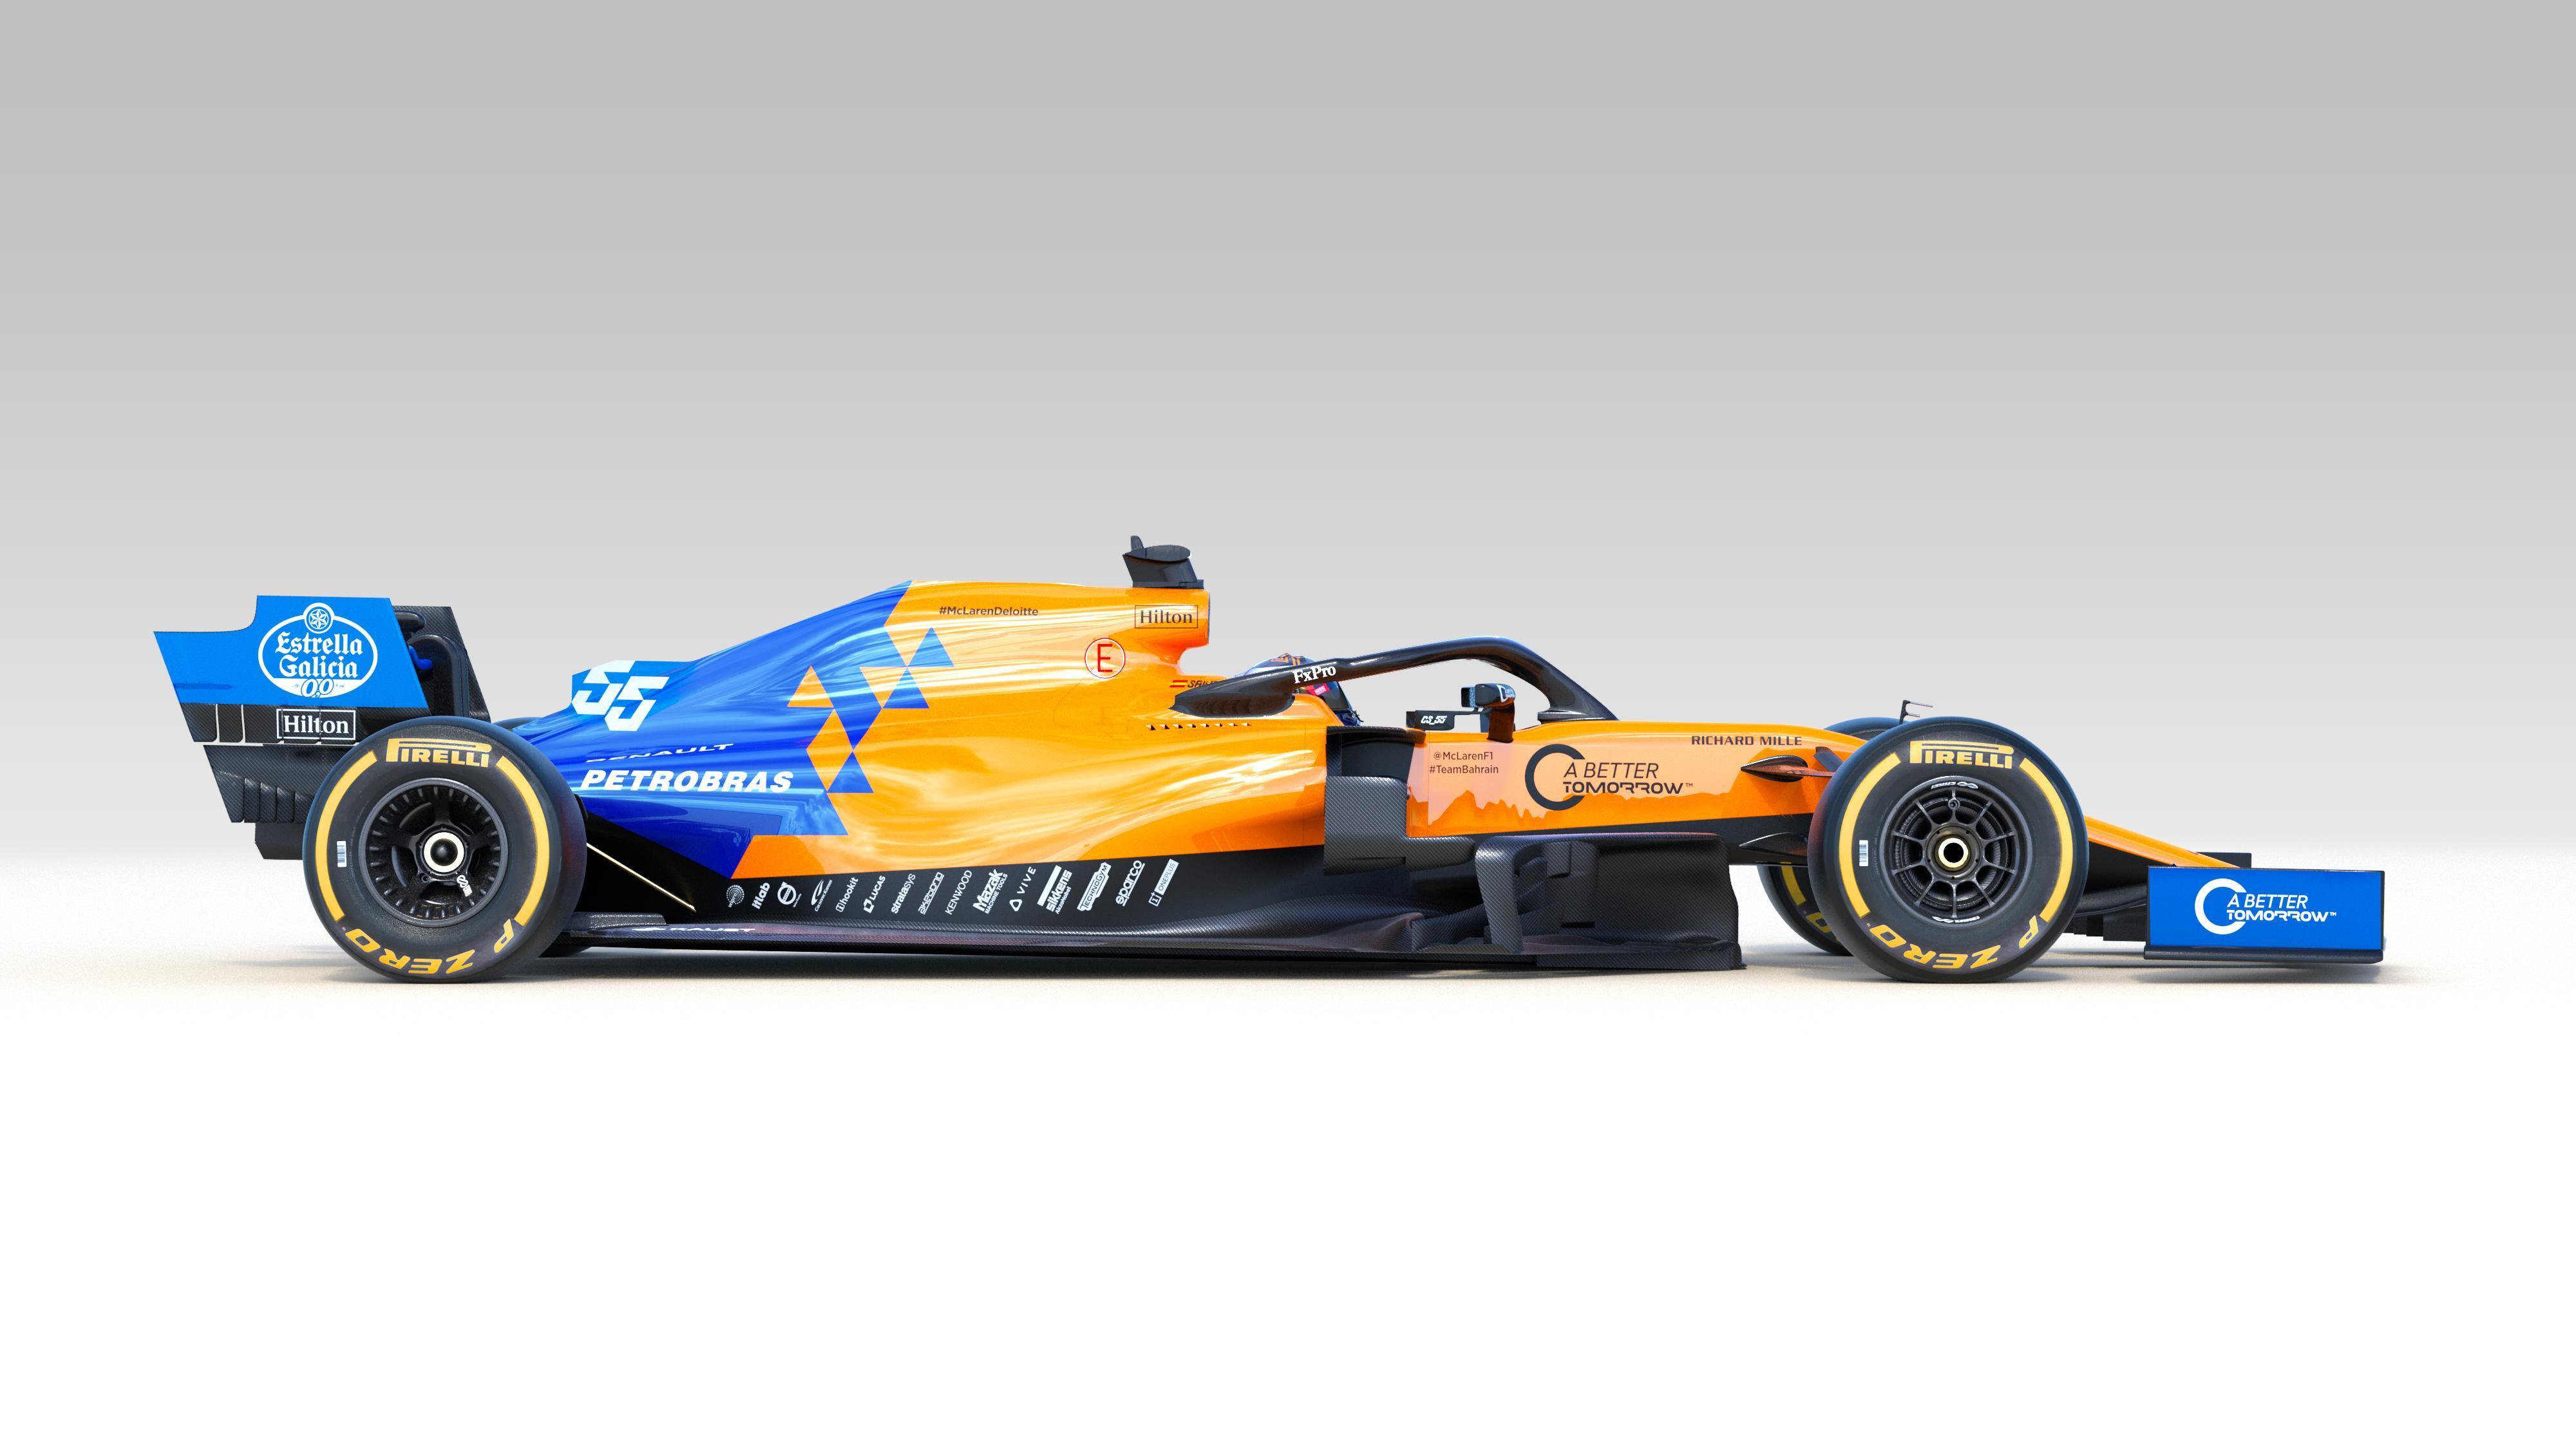 F1 2019 Wallpapers - Wallpaper Cave